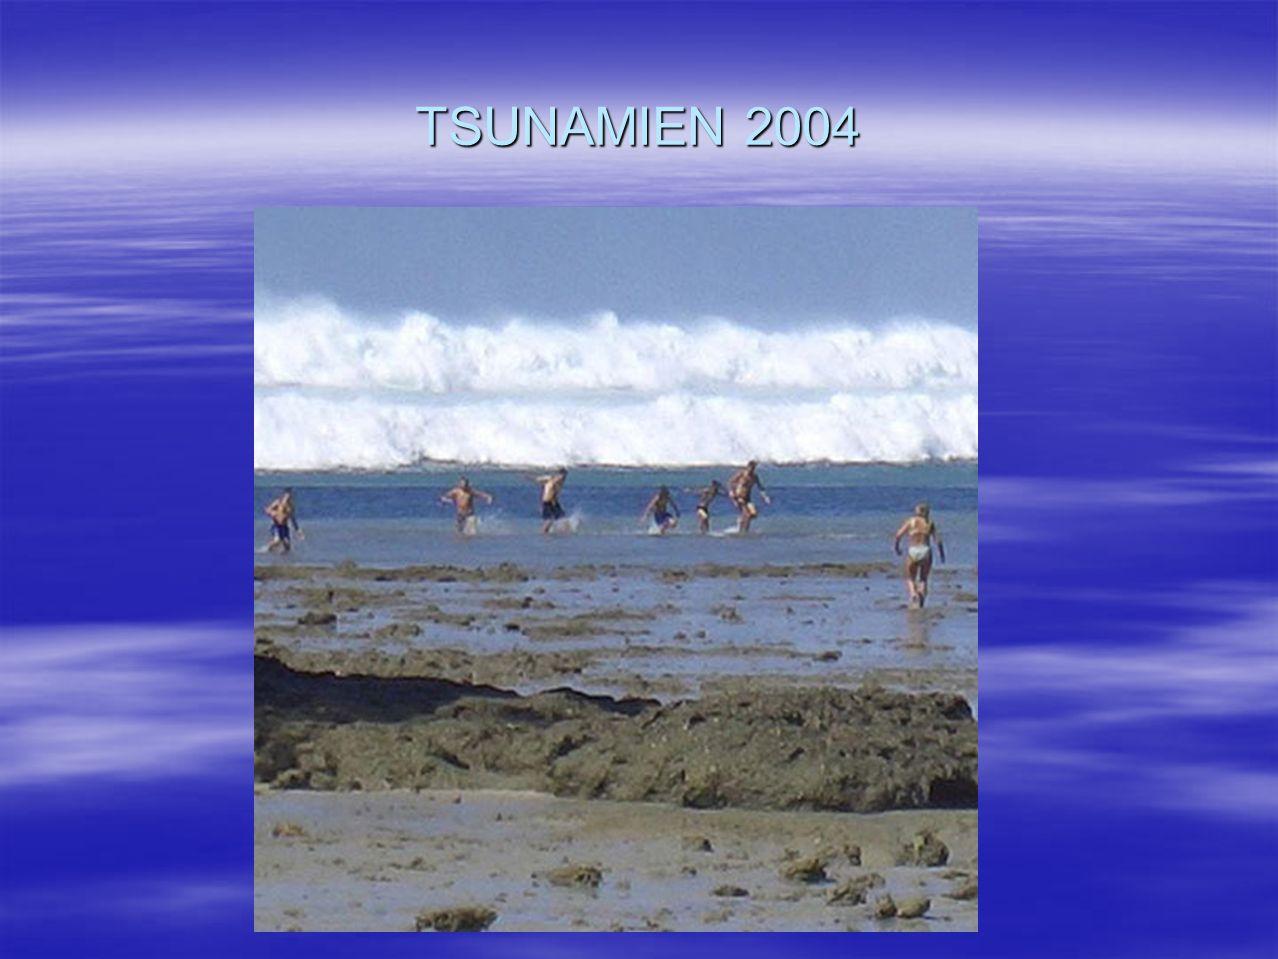 TSUNAMIEN 2004